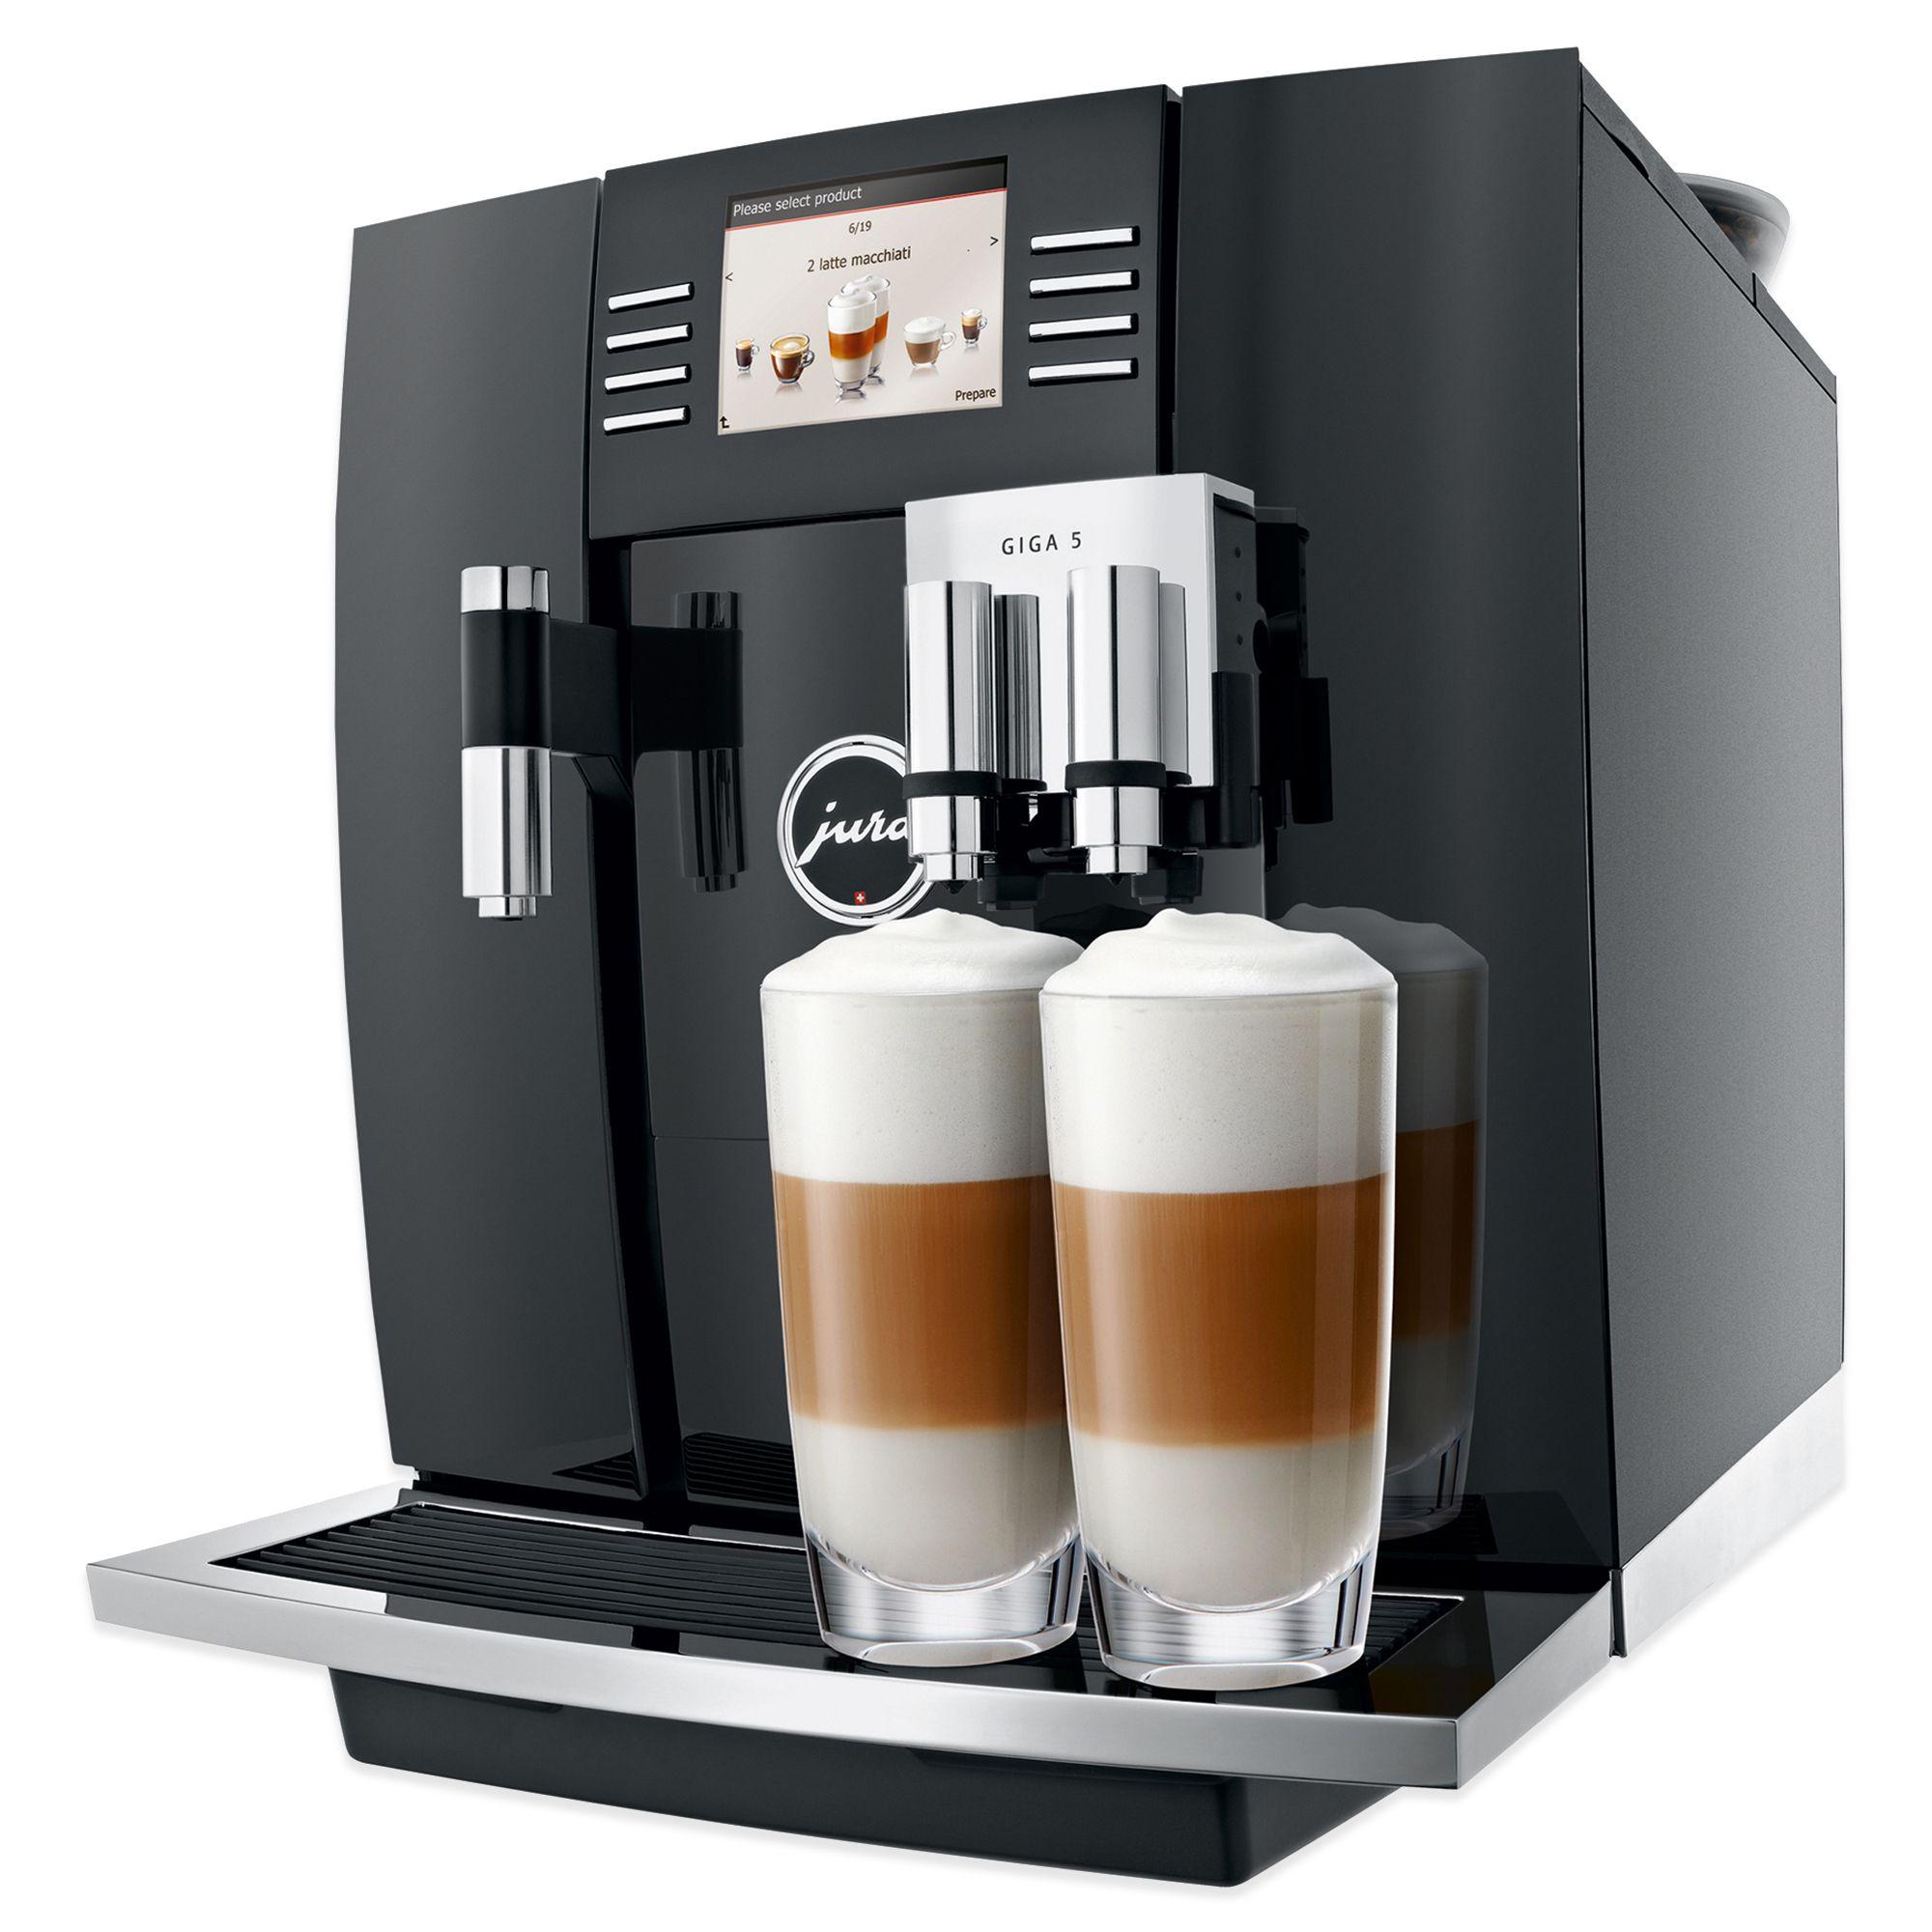 Jura® Giga 5 Coffee Center